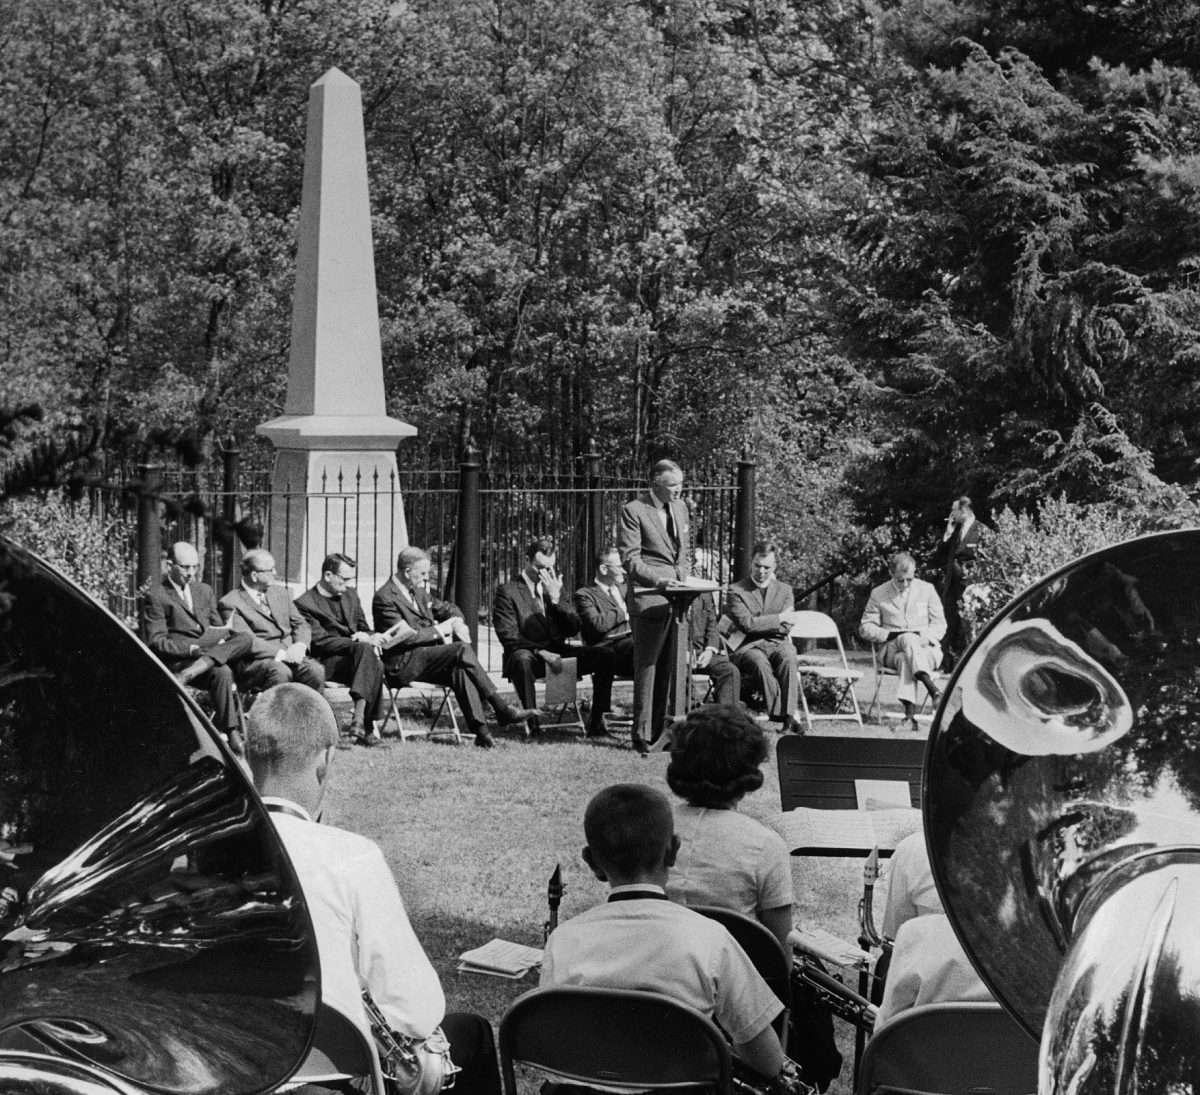 Centennial Commemoration of the Death of Confederate General J. E. B. Stuart